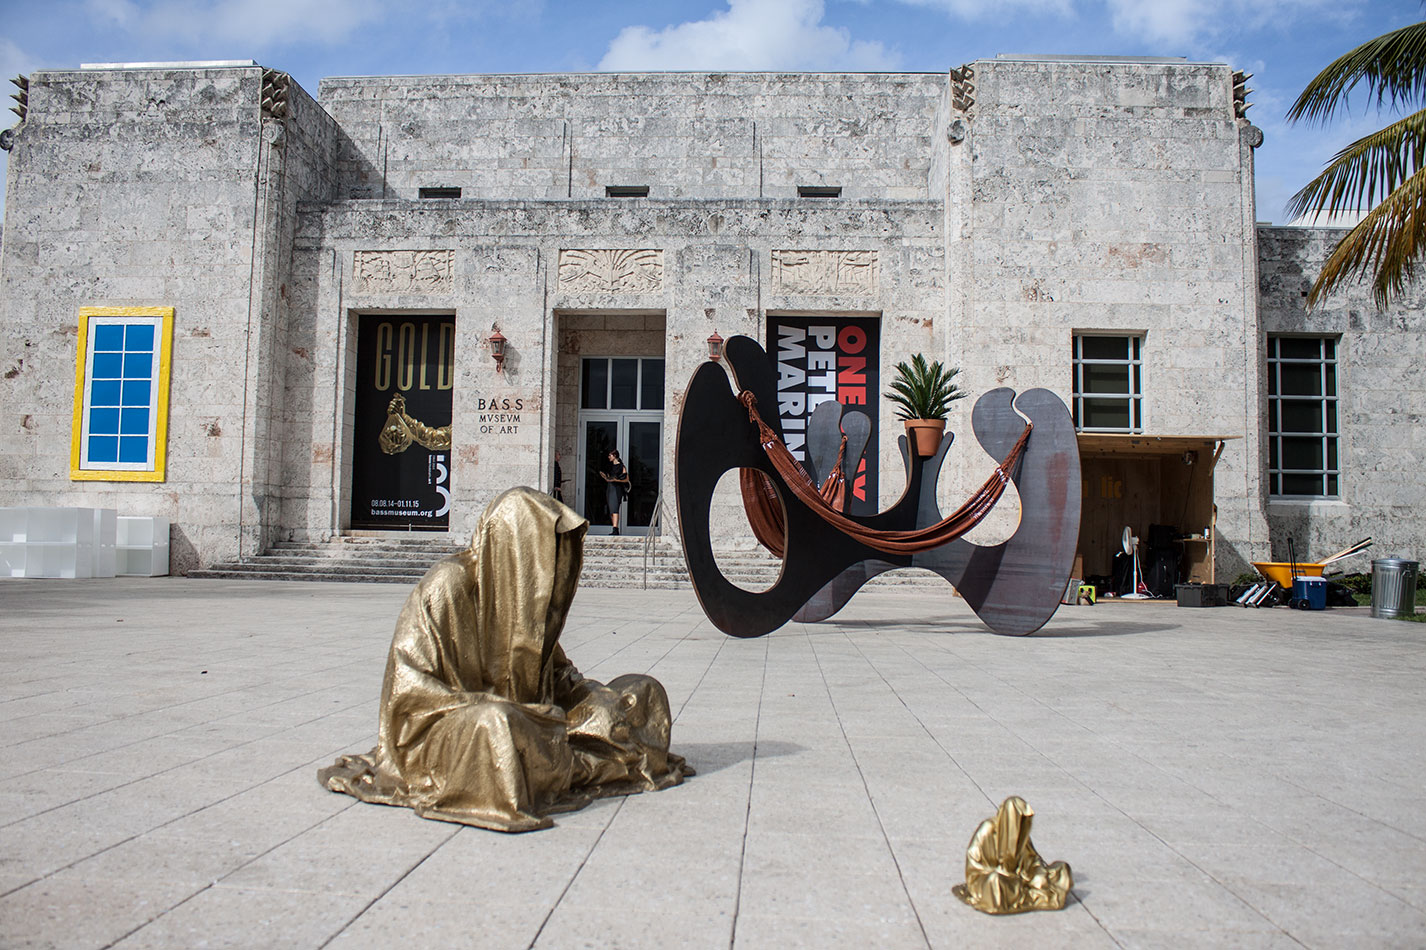 art-basel-miami-beach-fair-usa-florida-bass-museum-guardians-of-time-manfred-kili-kielnhofer-contemporary-fine-art-modern-arts-design-antiques-sculpture-6229